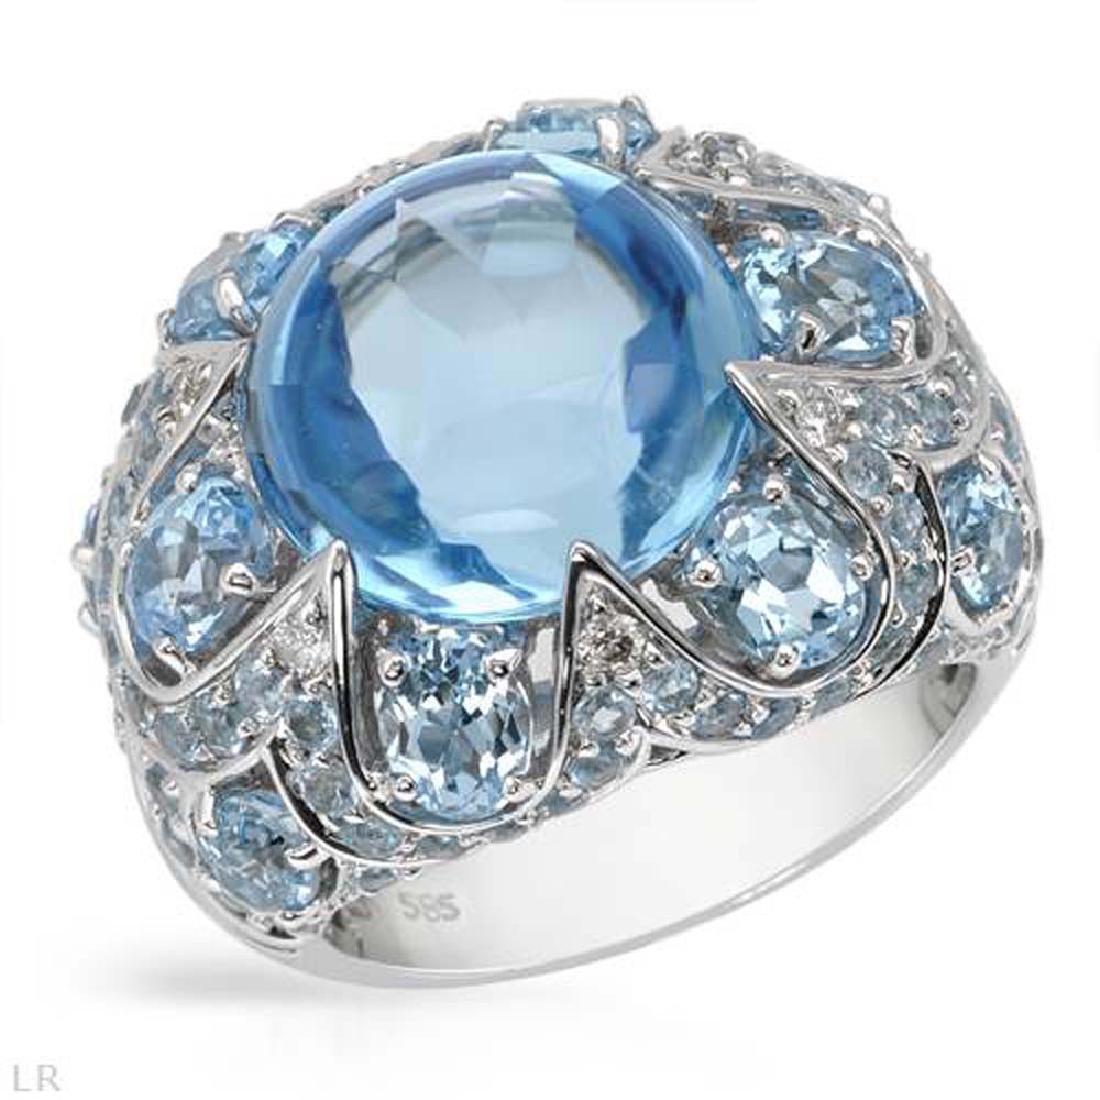 17.97 CTW Topaz Fashion  Ring in 14K White Gold